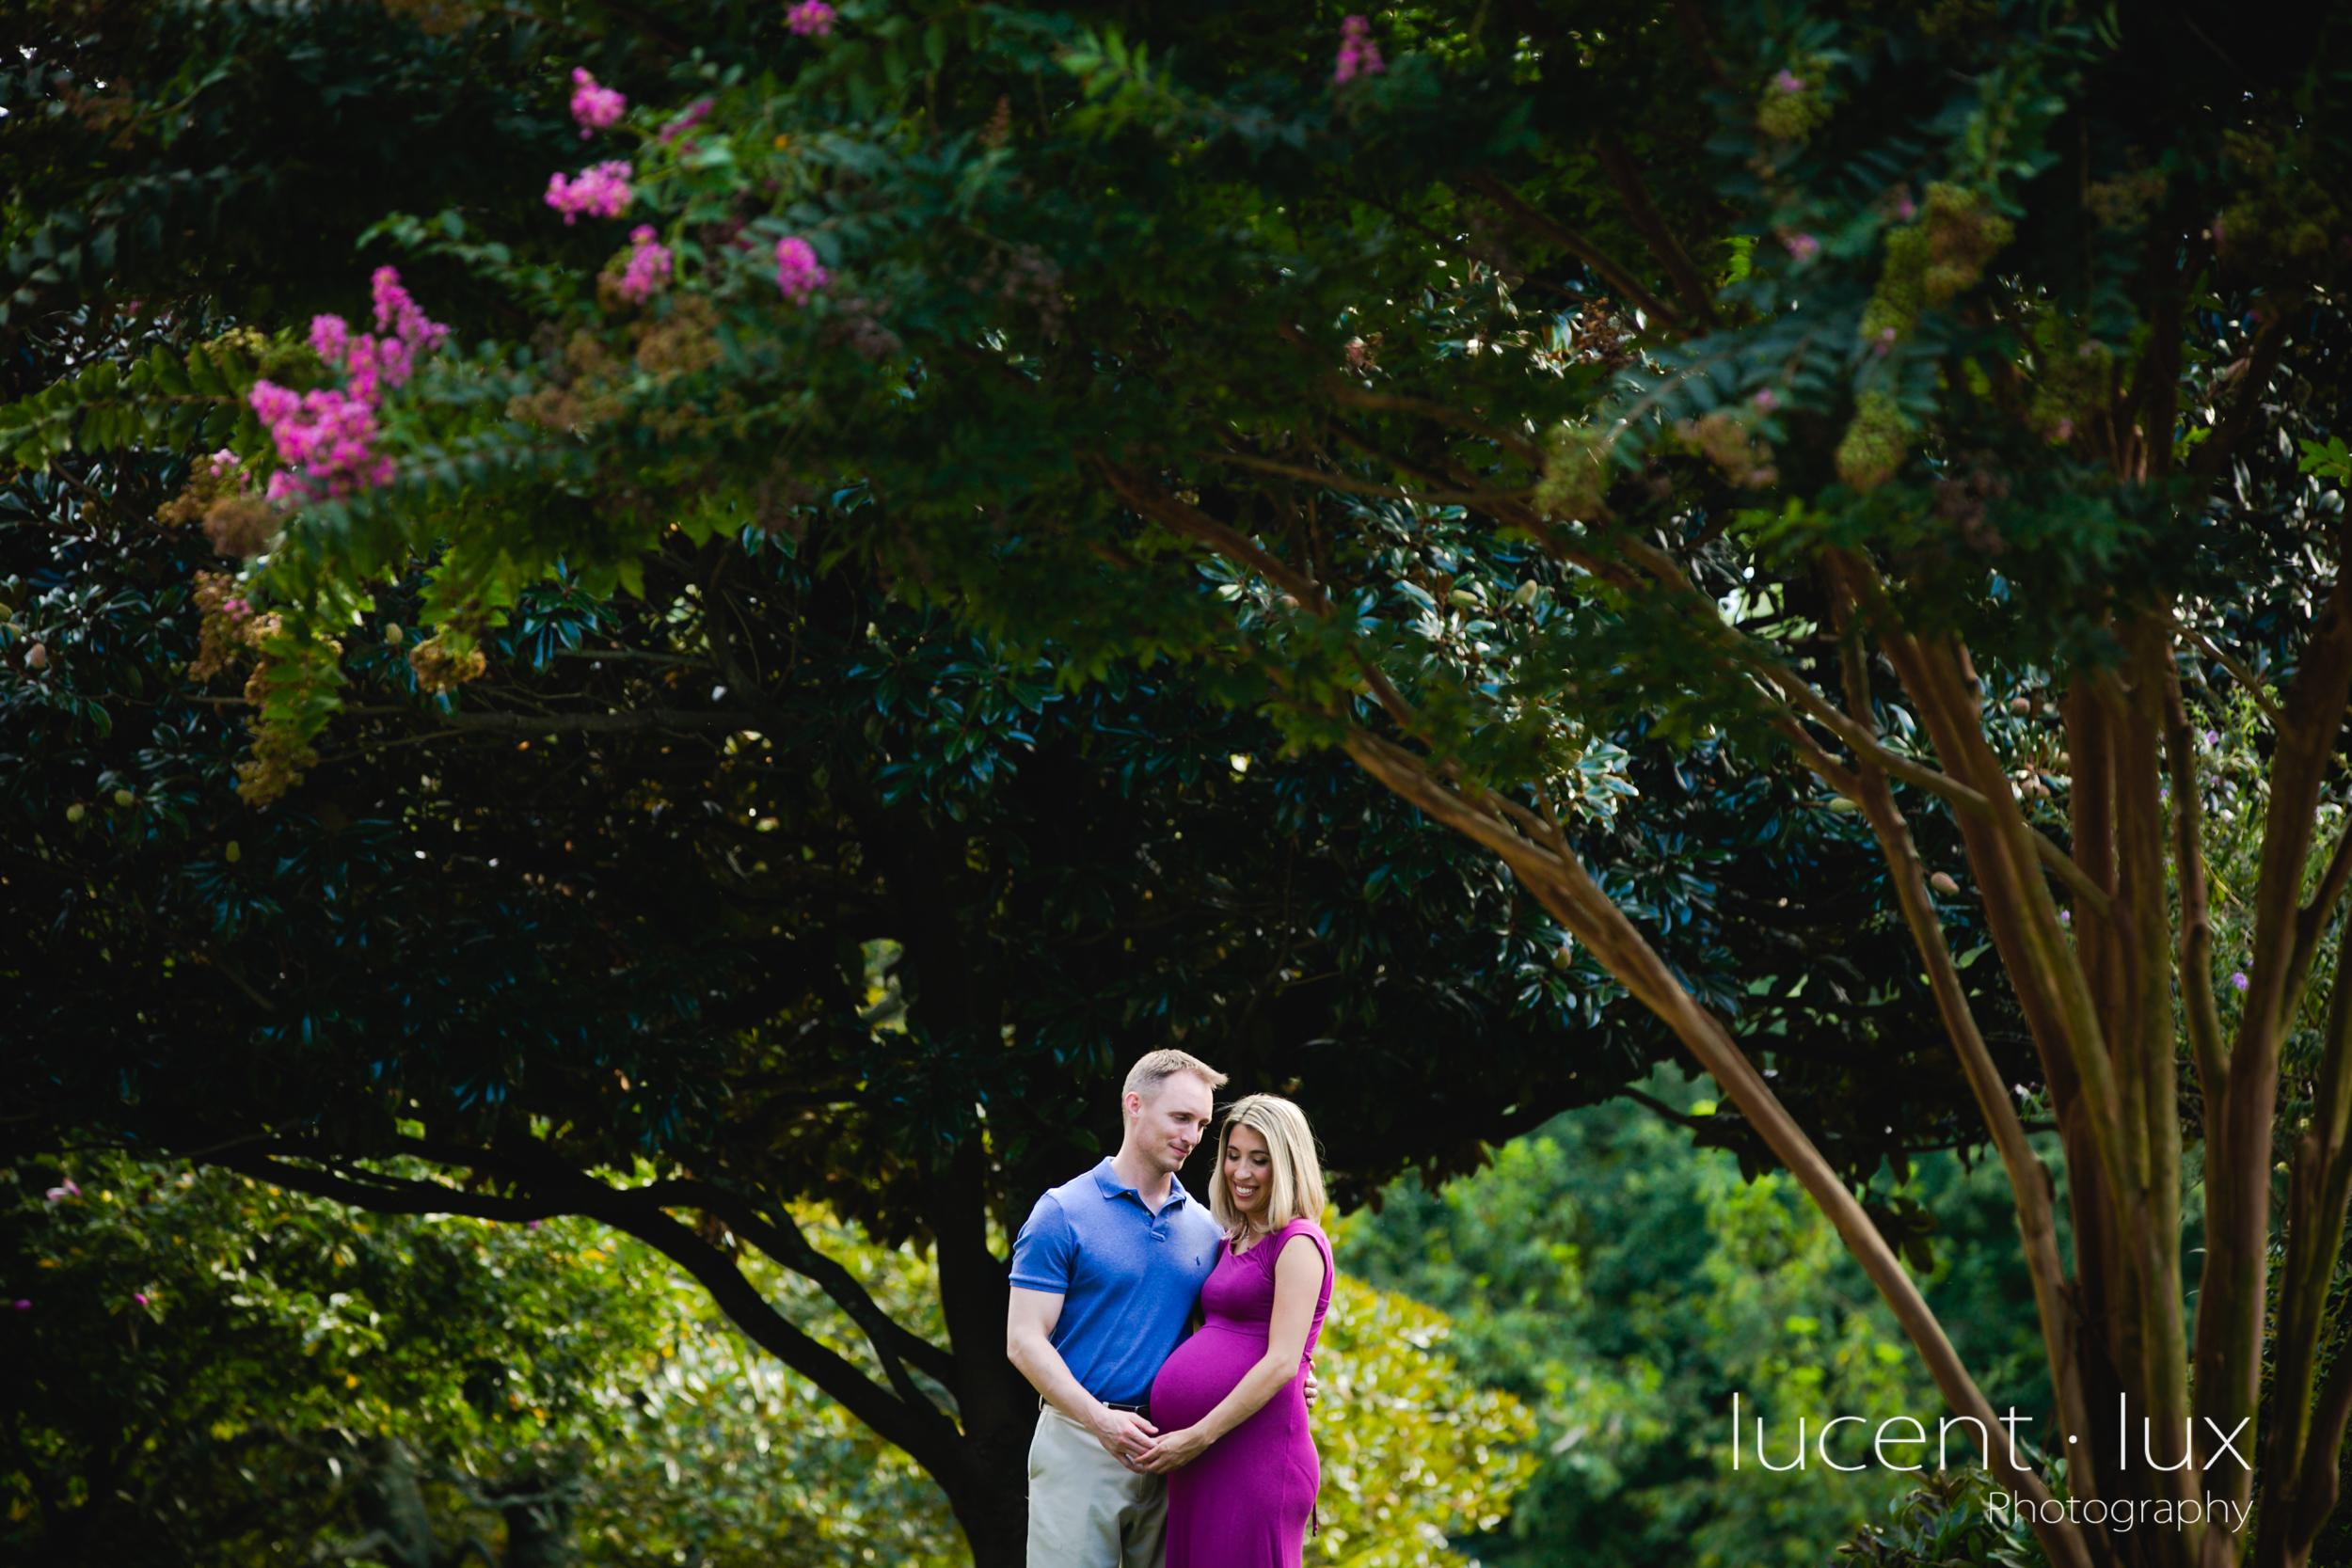 Maternity-Photography-Maryland-Baltimore-Photographer-Family-Portraits-Couple-Engagement-Newborn-201.jpg